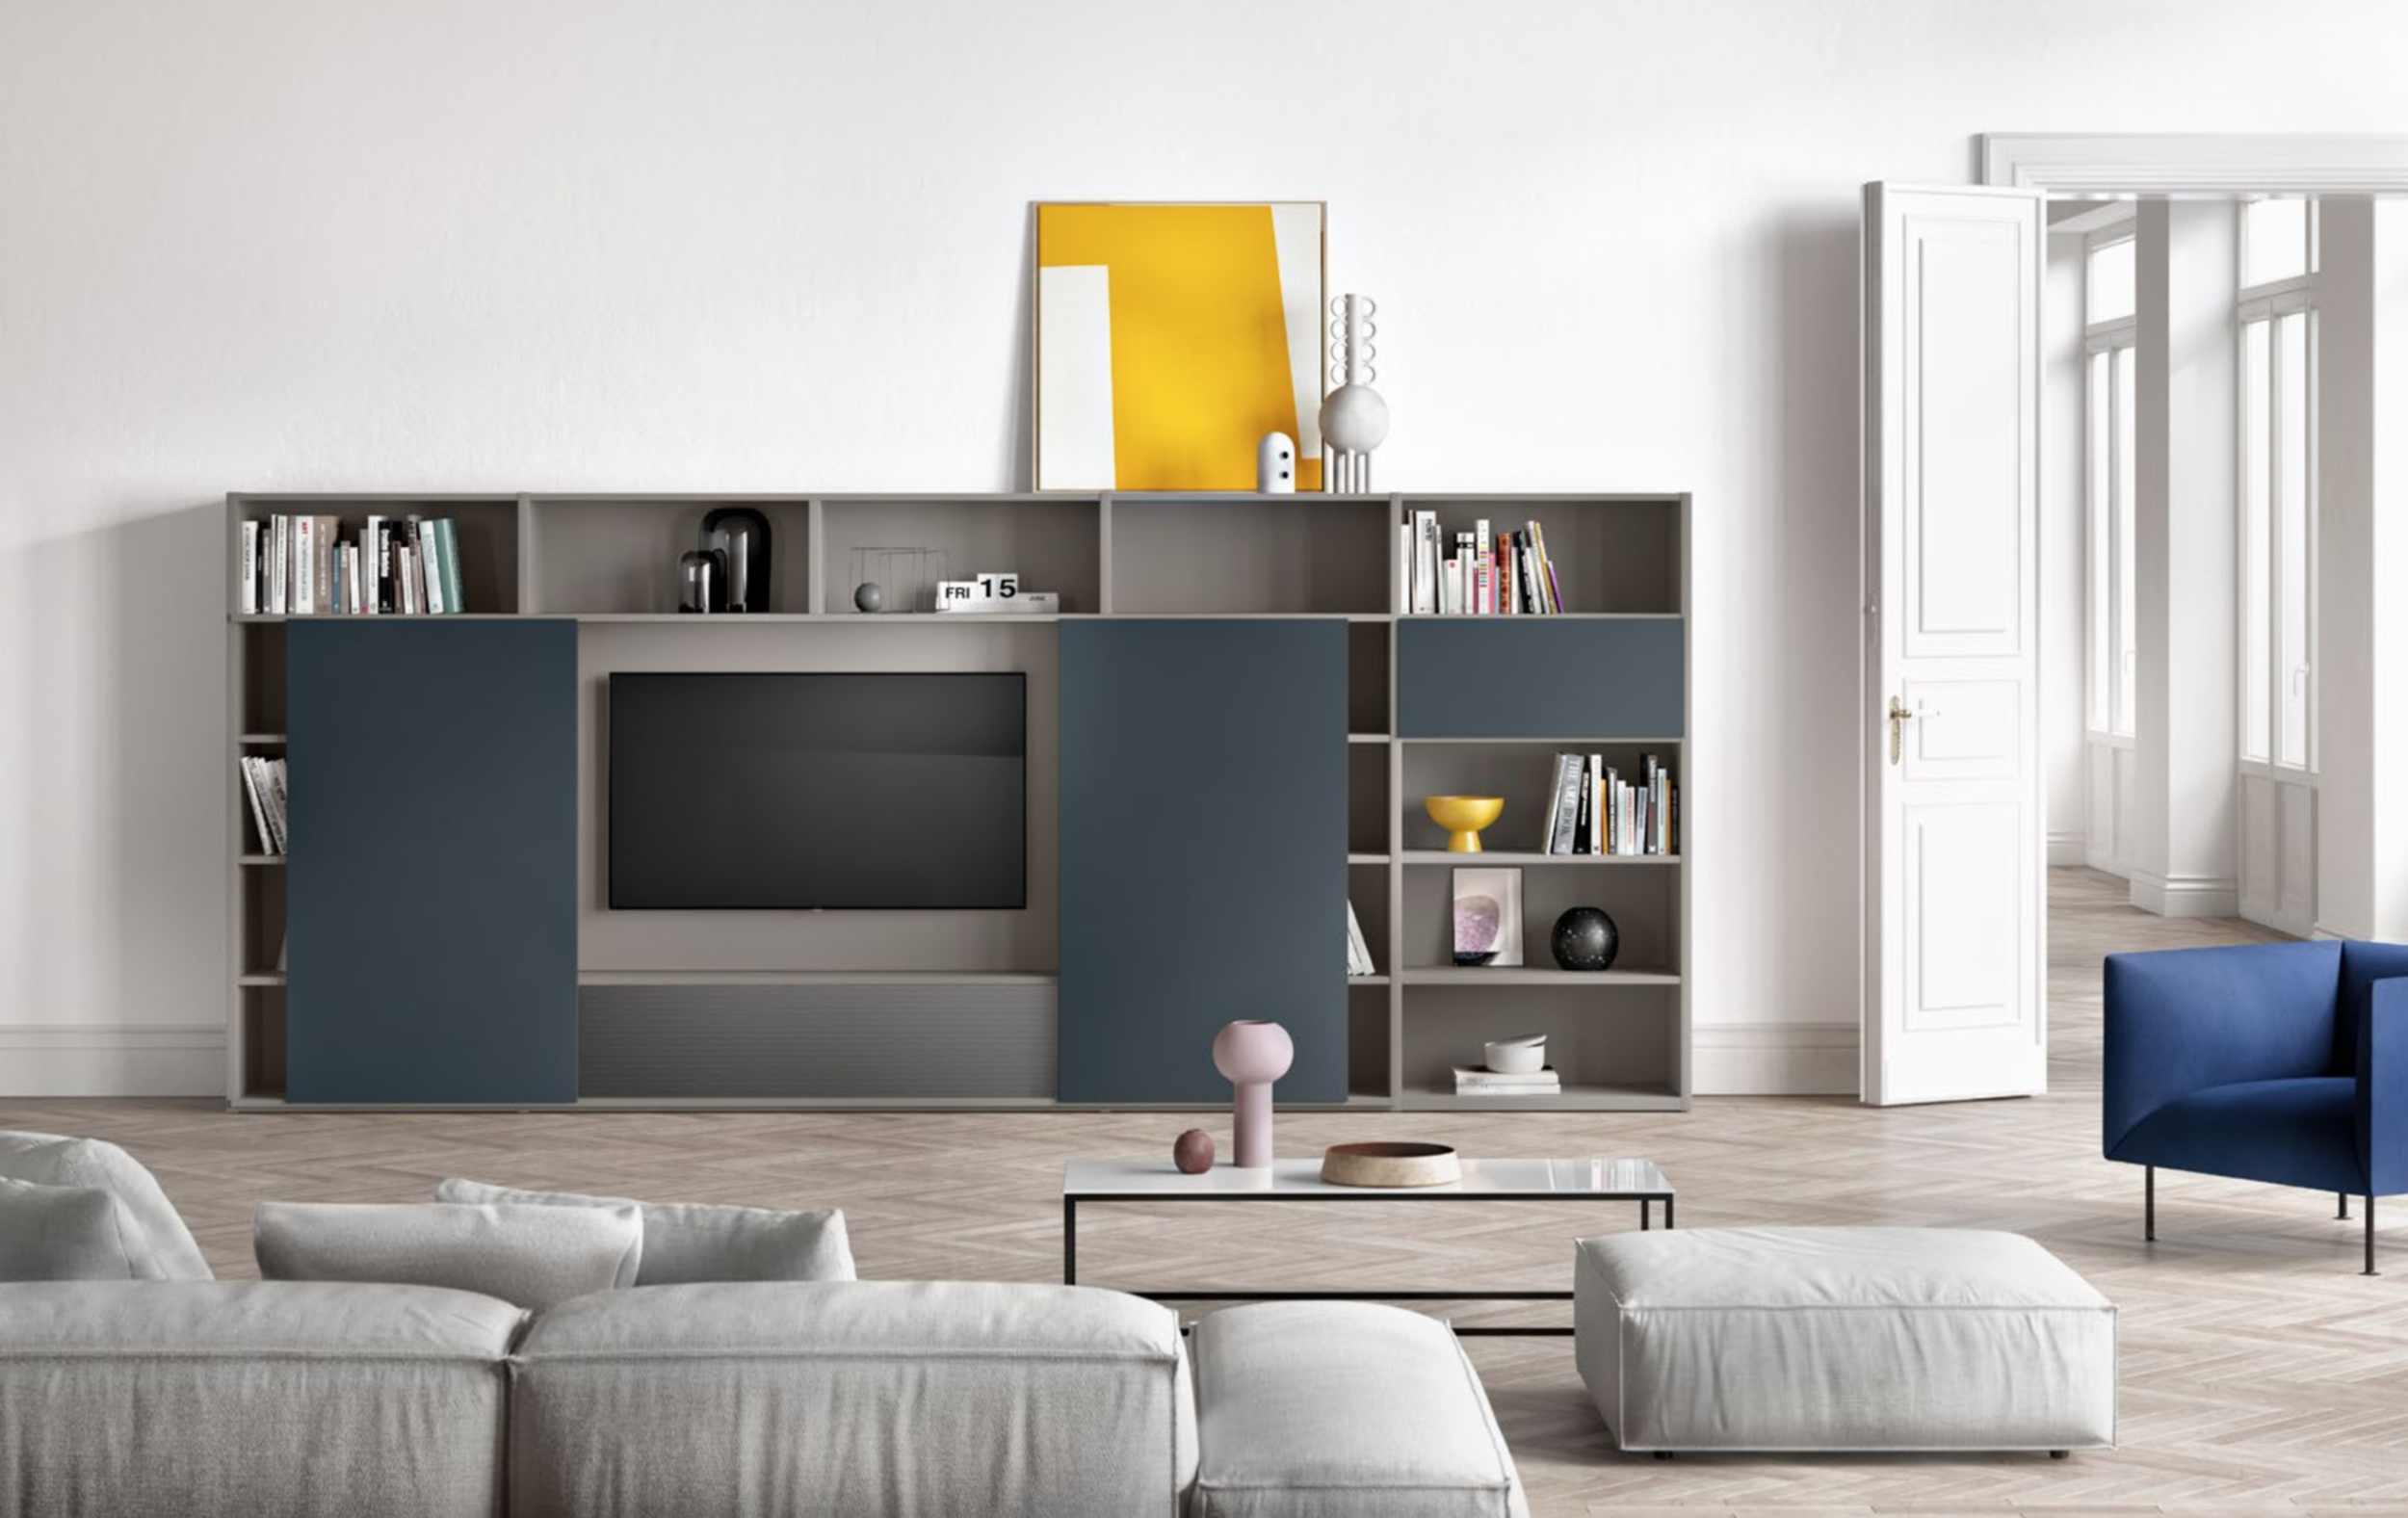 Tv Kast Interlubke.Kasten Voor Je T V Ruimte Loncin Interieur A Beautiful Home